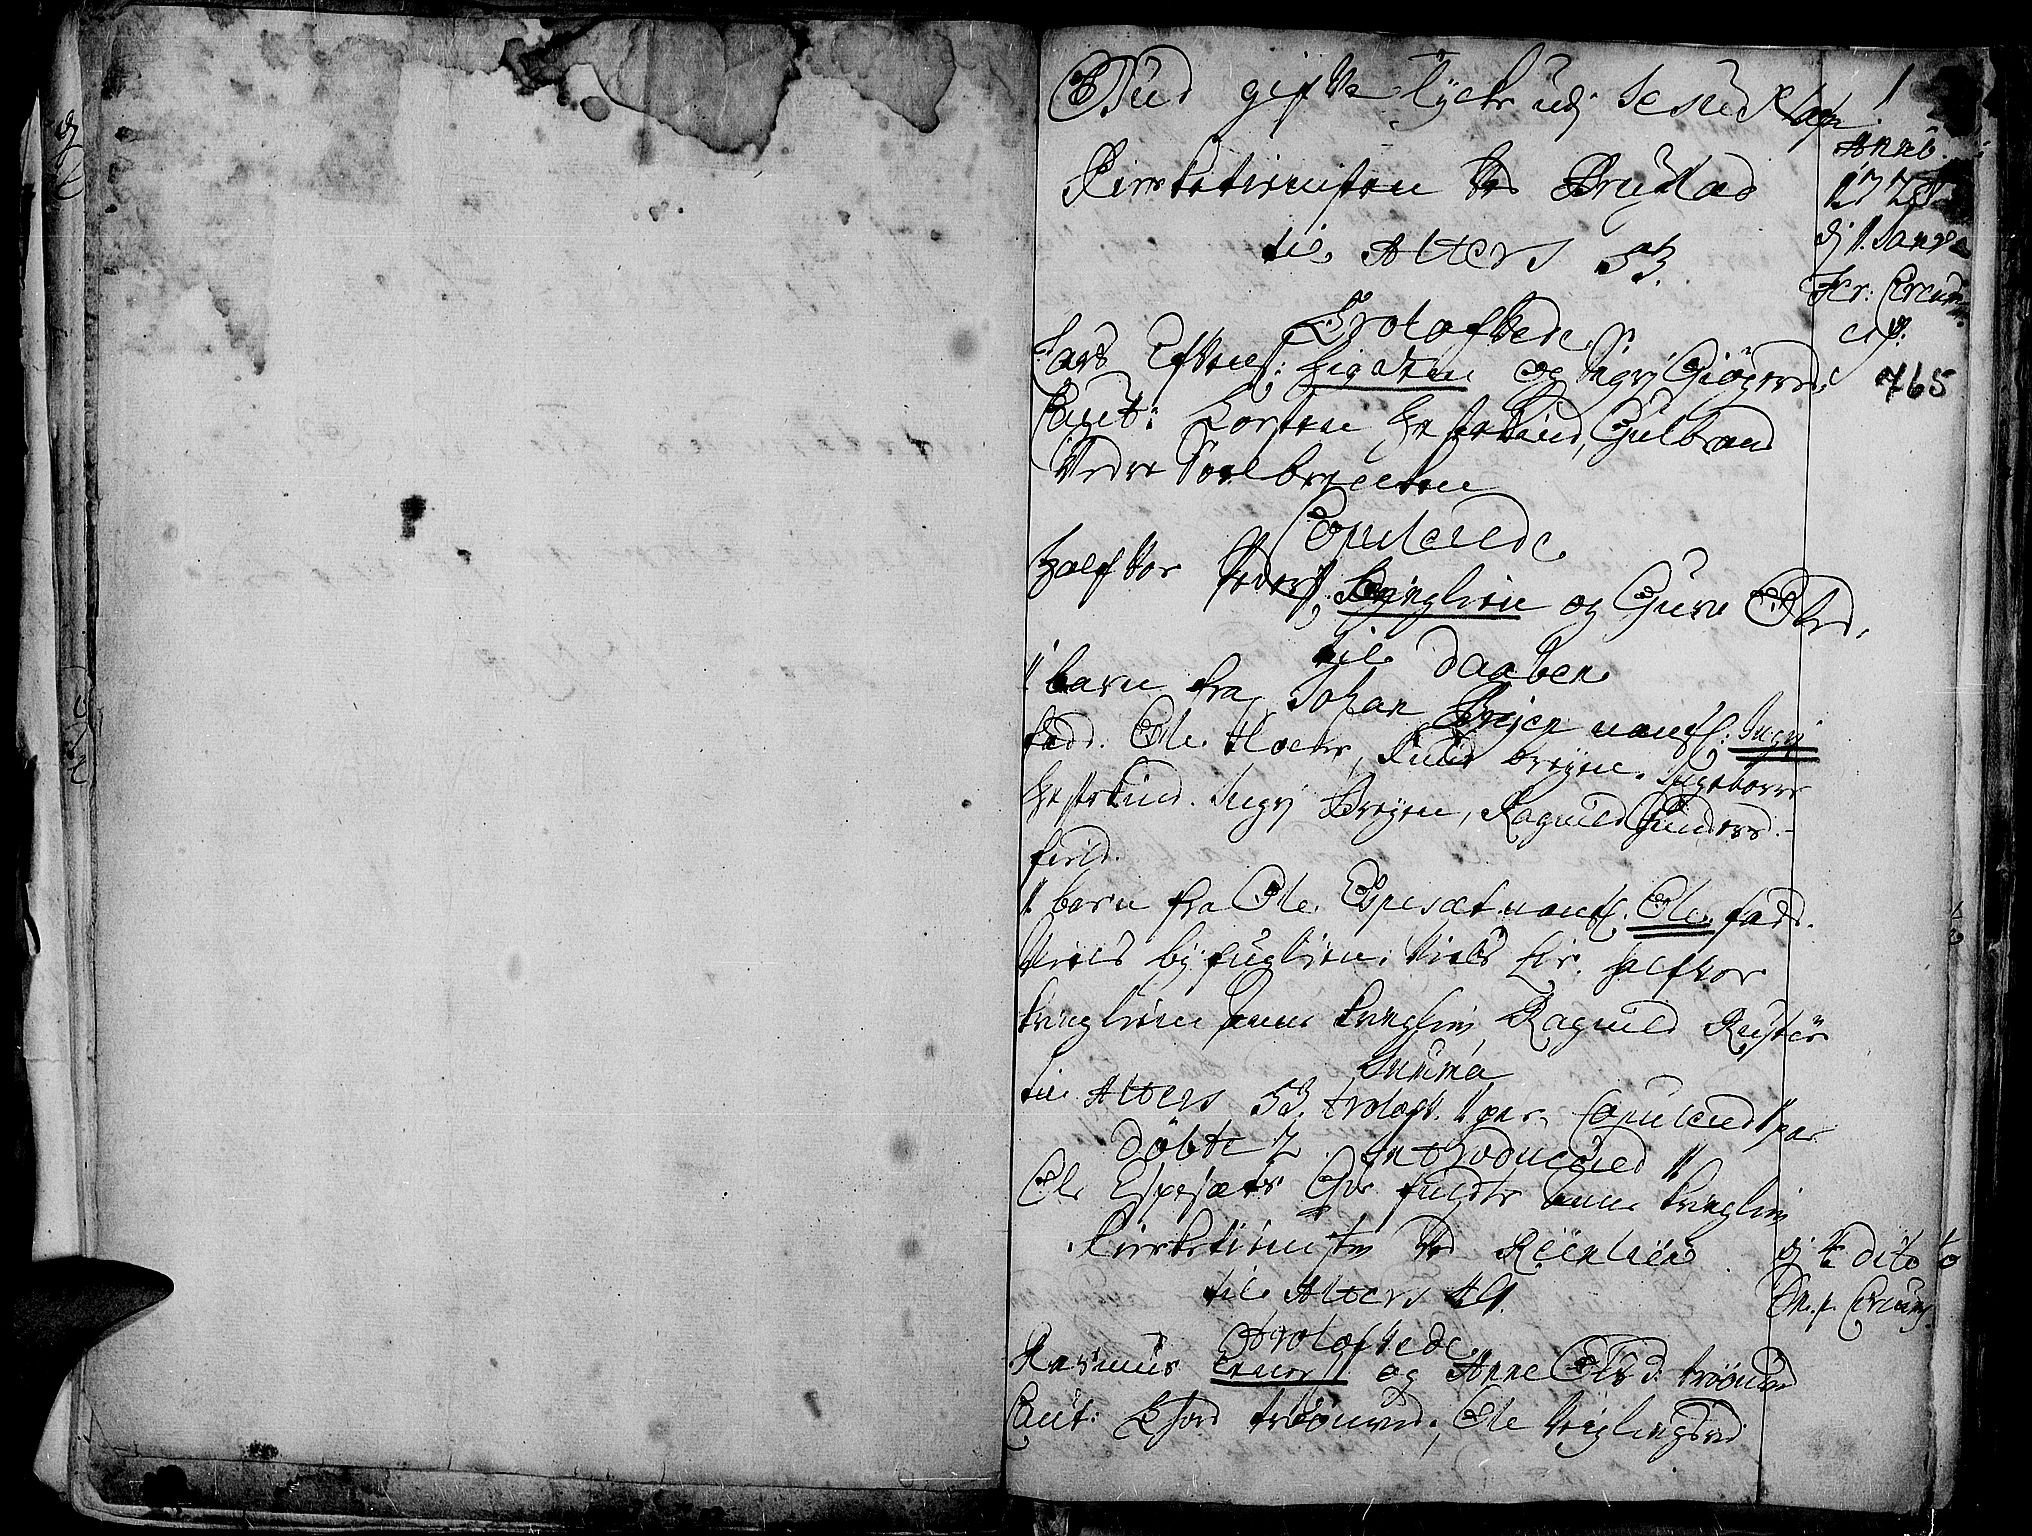 SAH, Aurdal prestekontor, Ministerialbok nr. 1-3, 1692-1730, s. 765